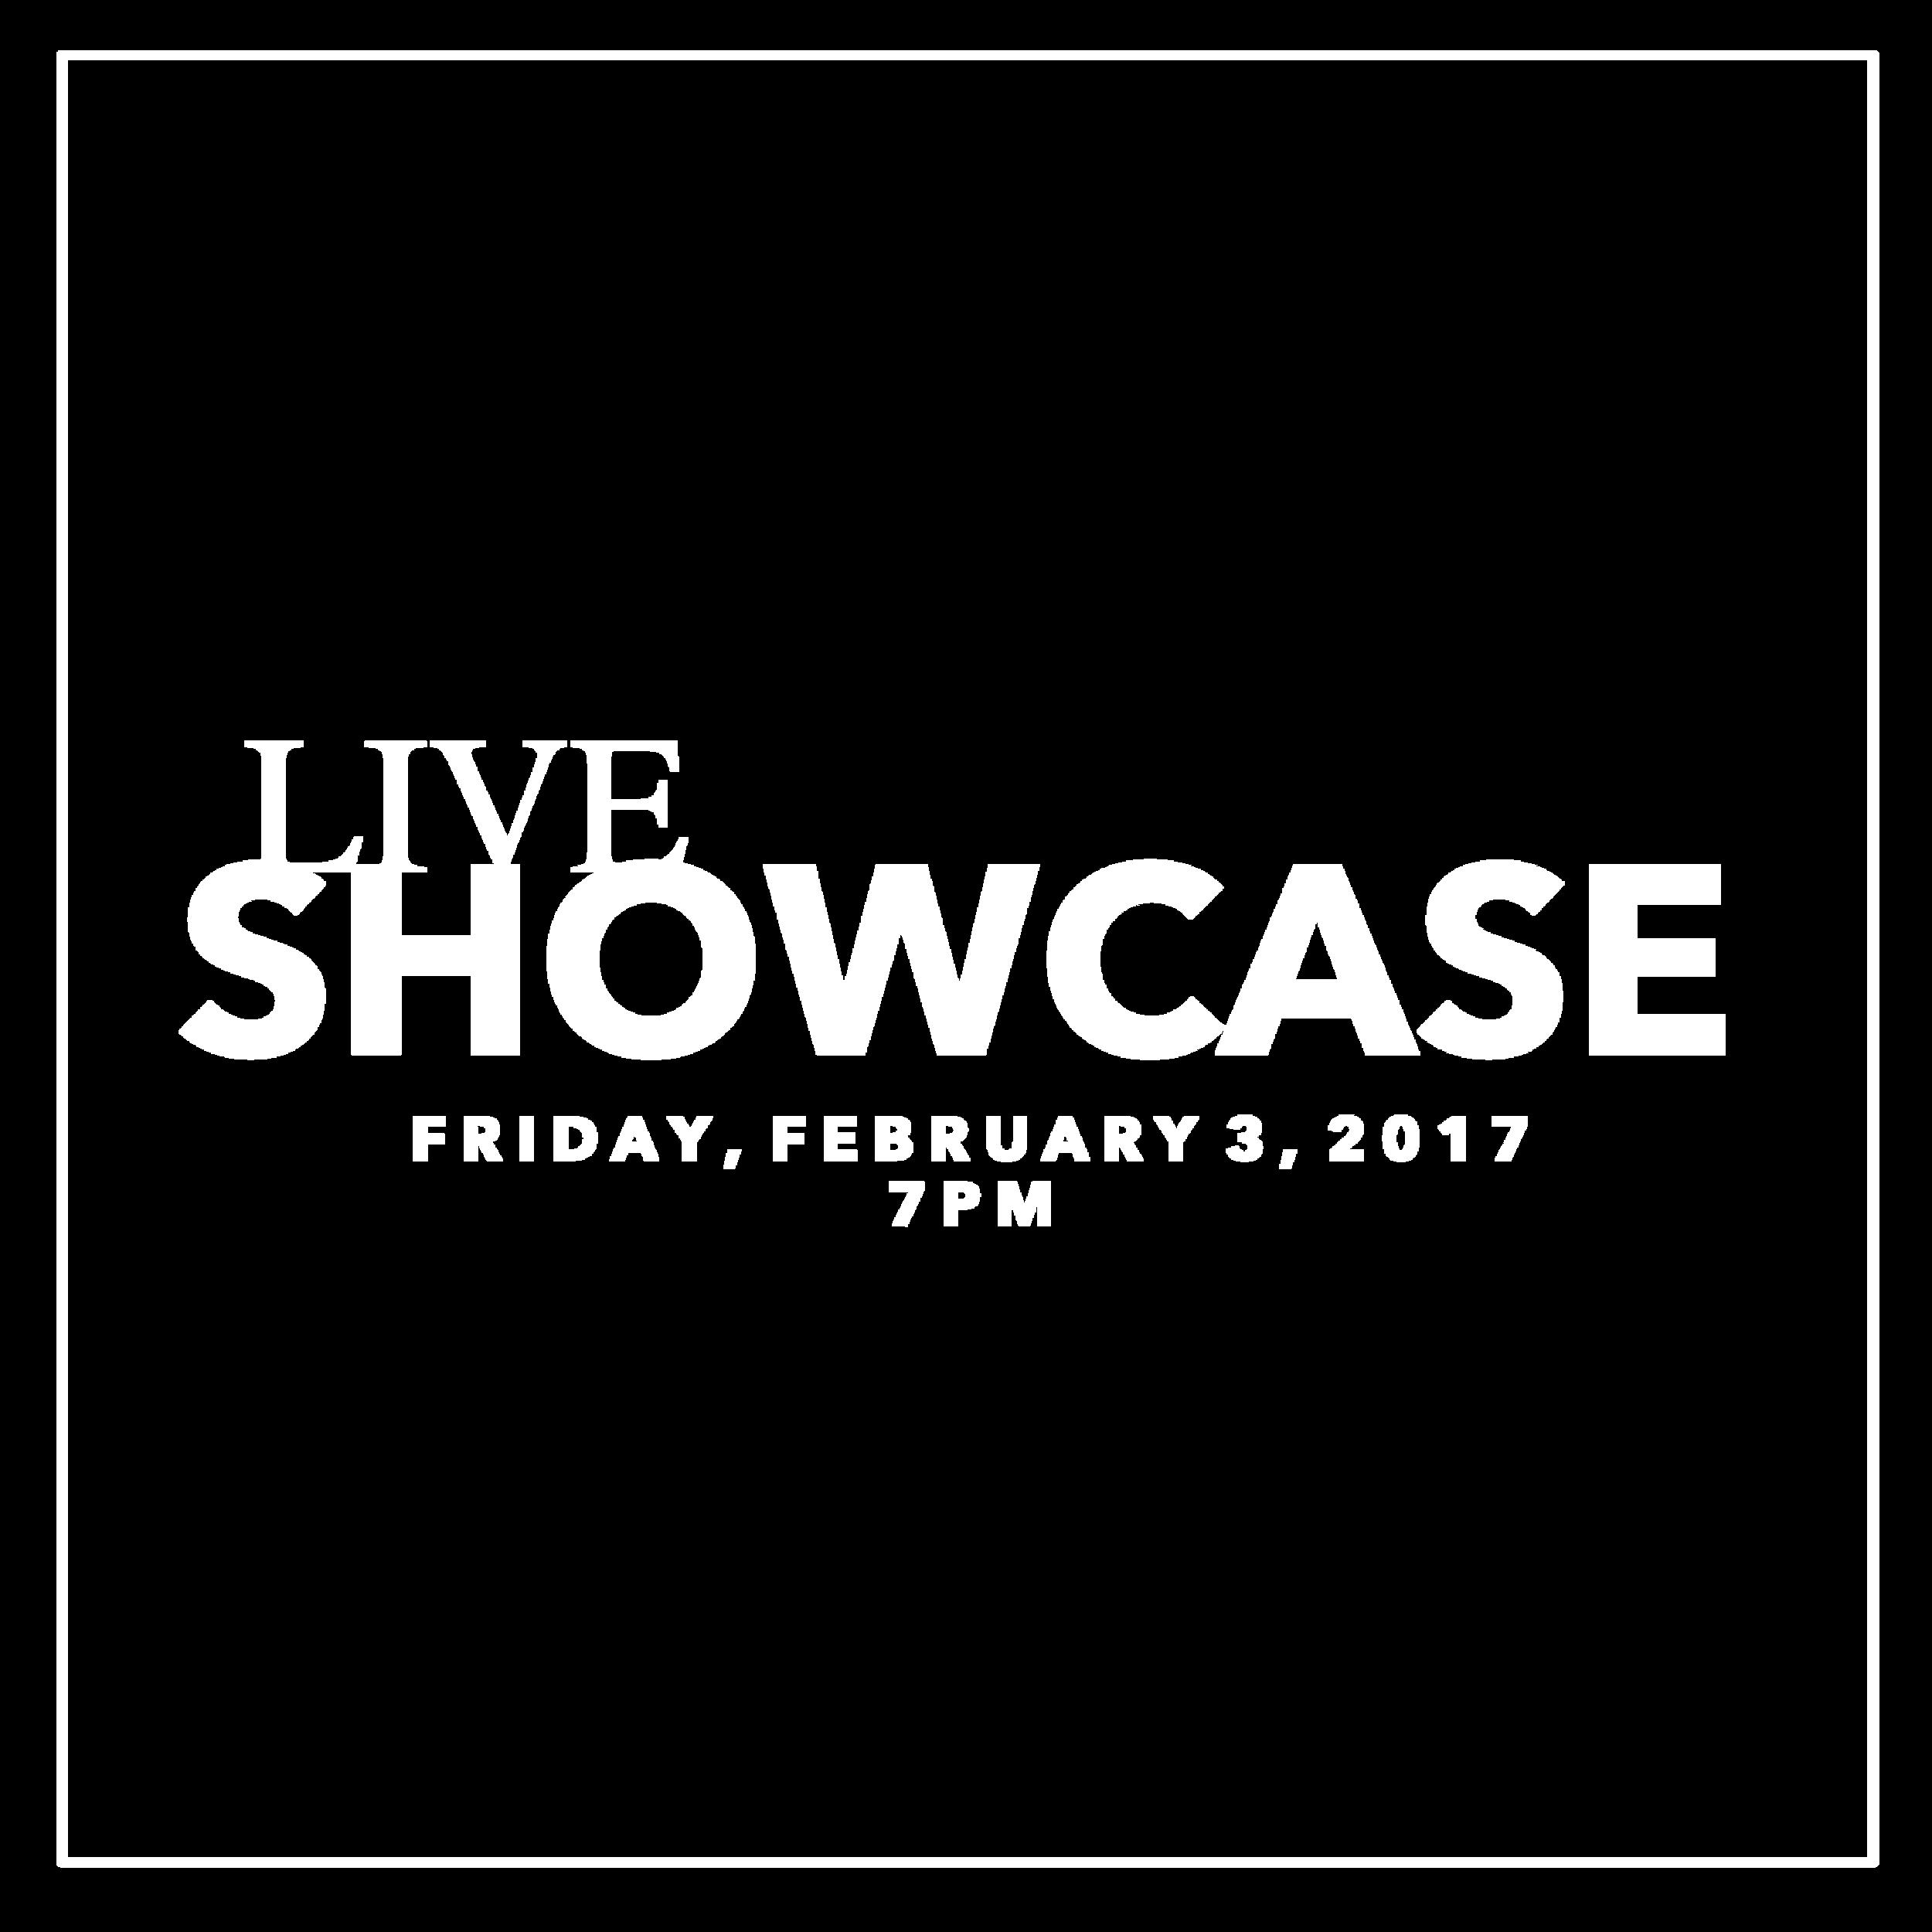 Live Showcase 2-3-17 Logo.png